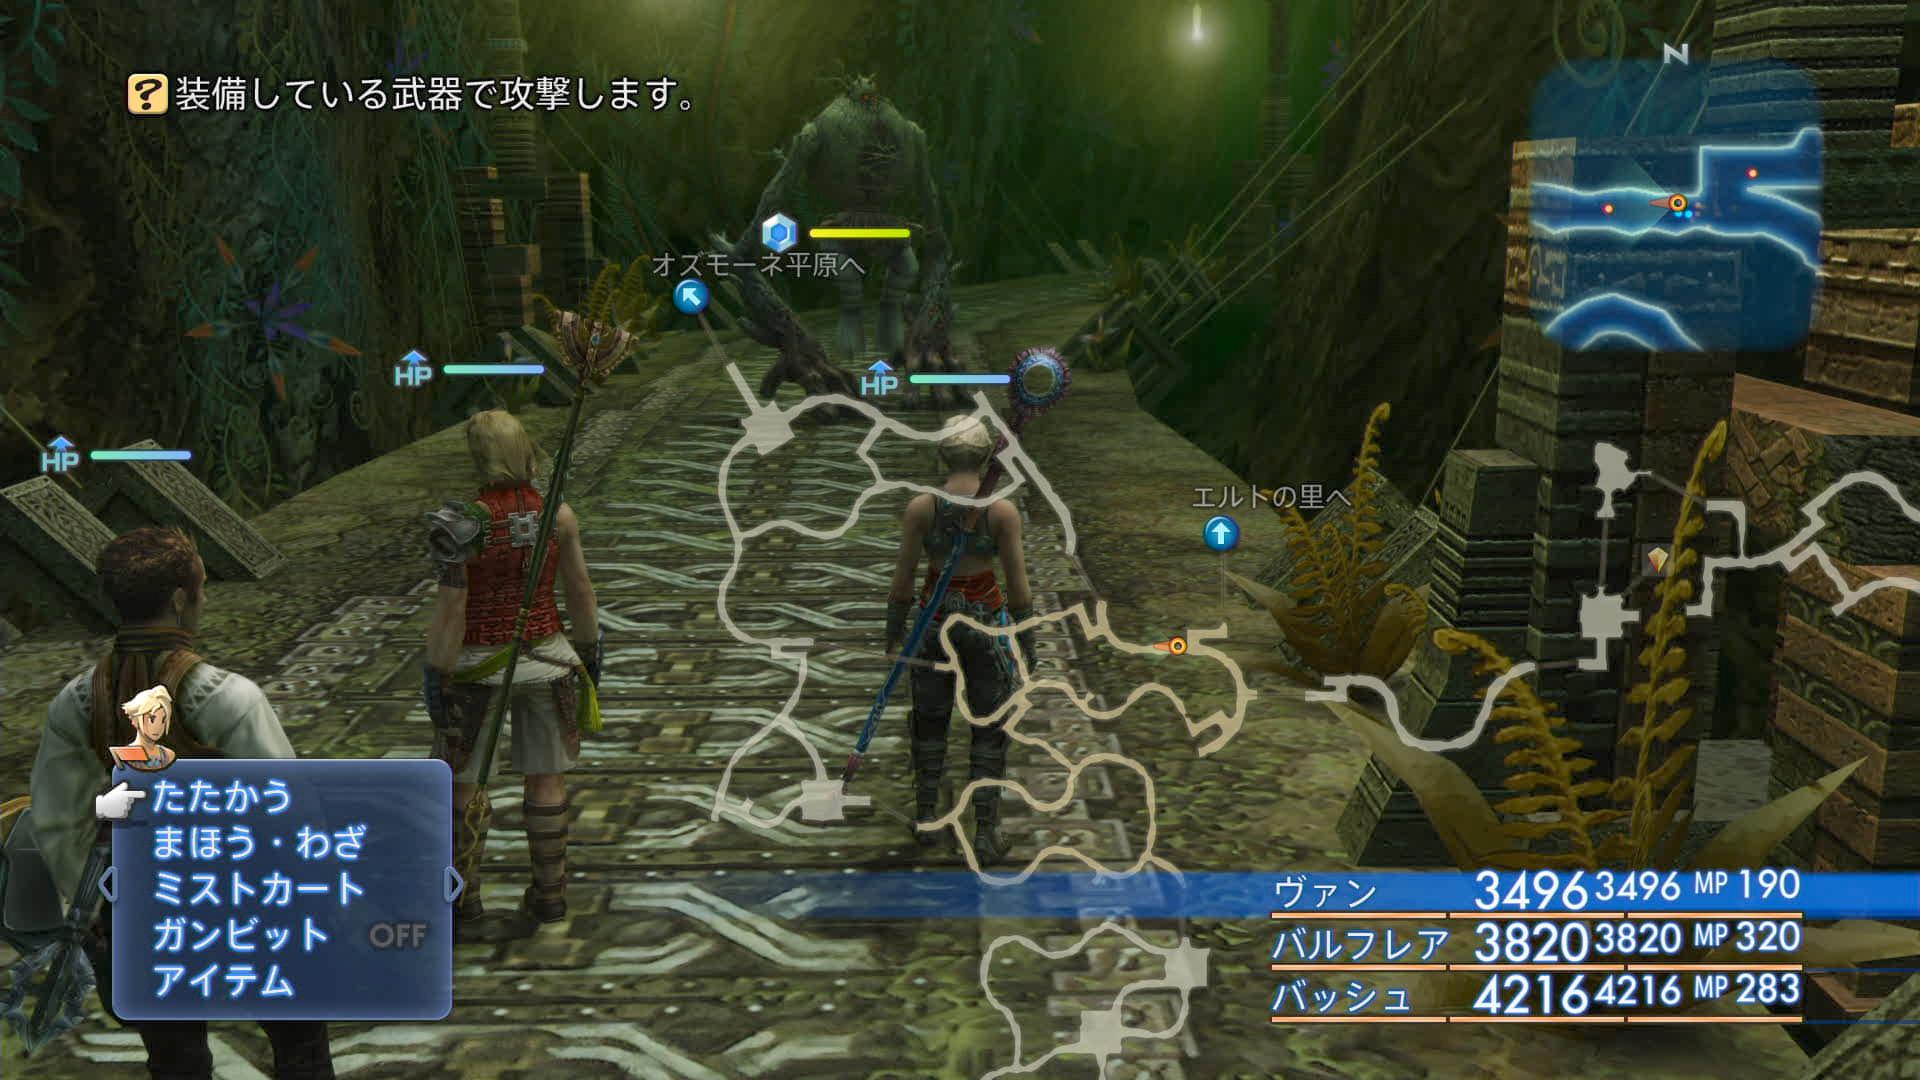 Final Fantasy XII: The Zodiac Age screenshots | RPG Site